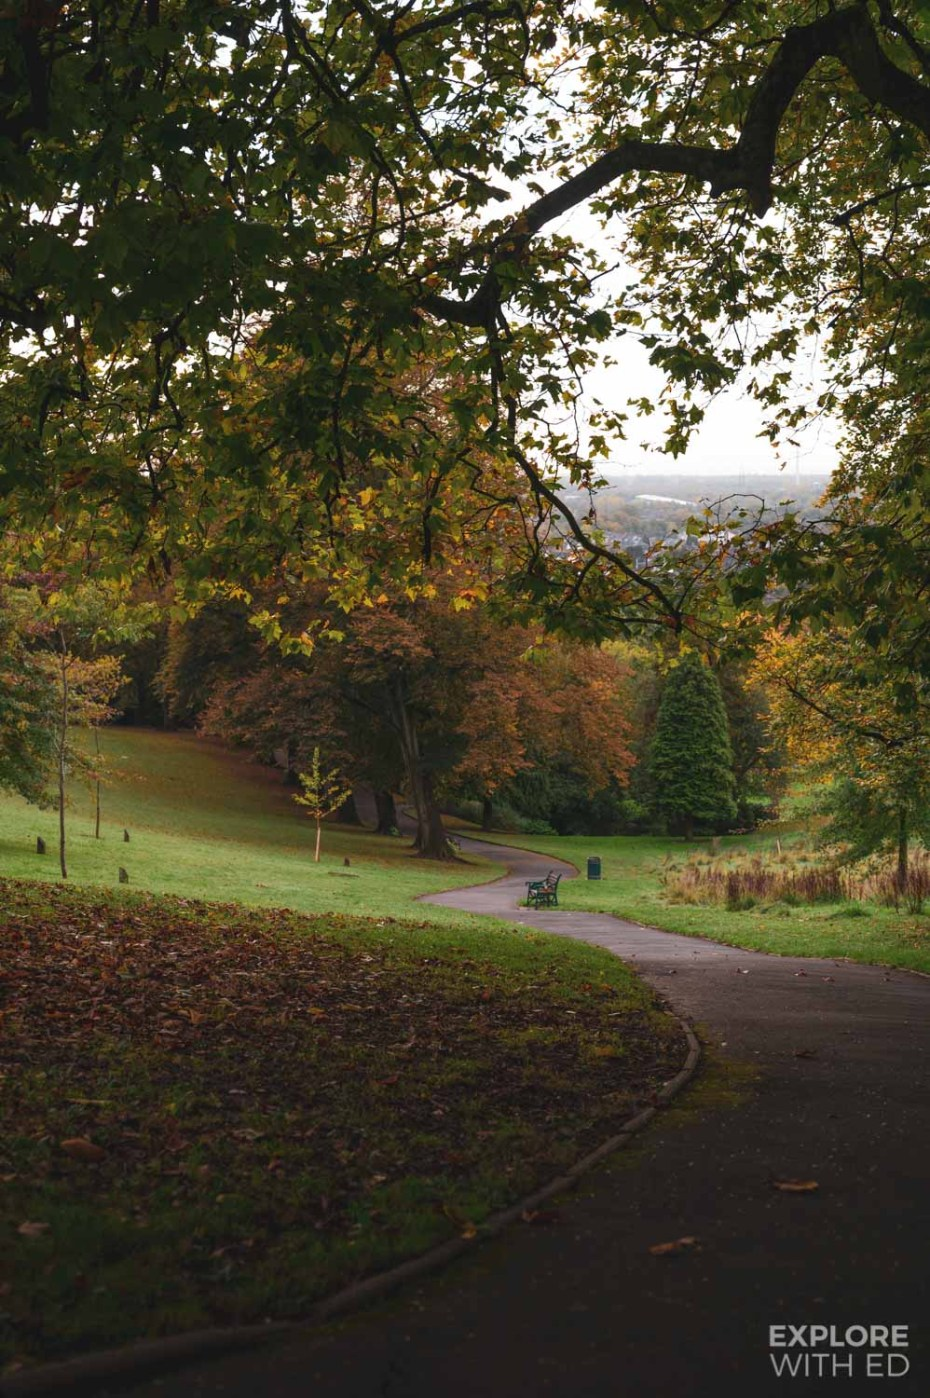 Autumn colours in Beechwood Park in Newport